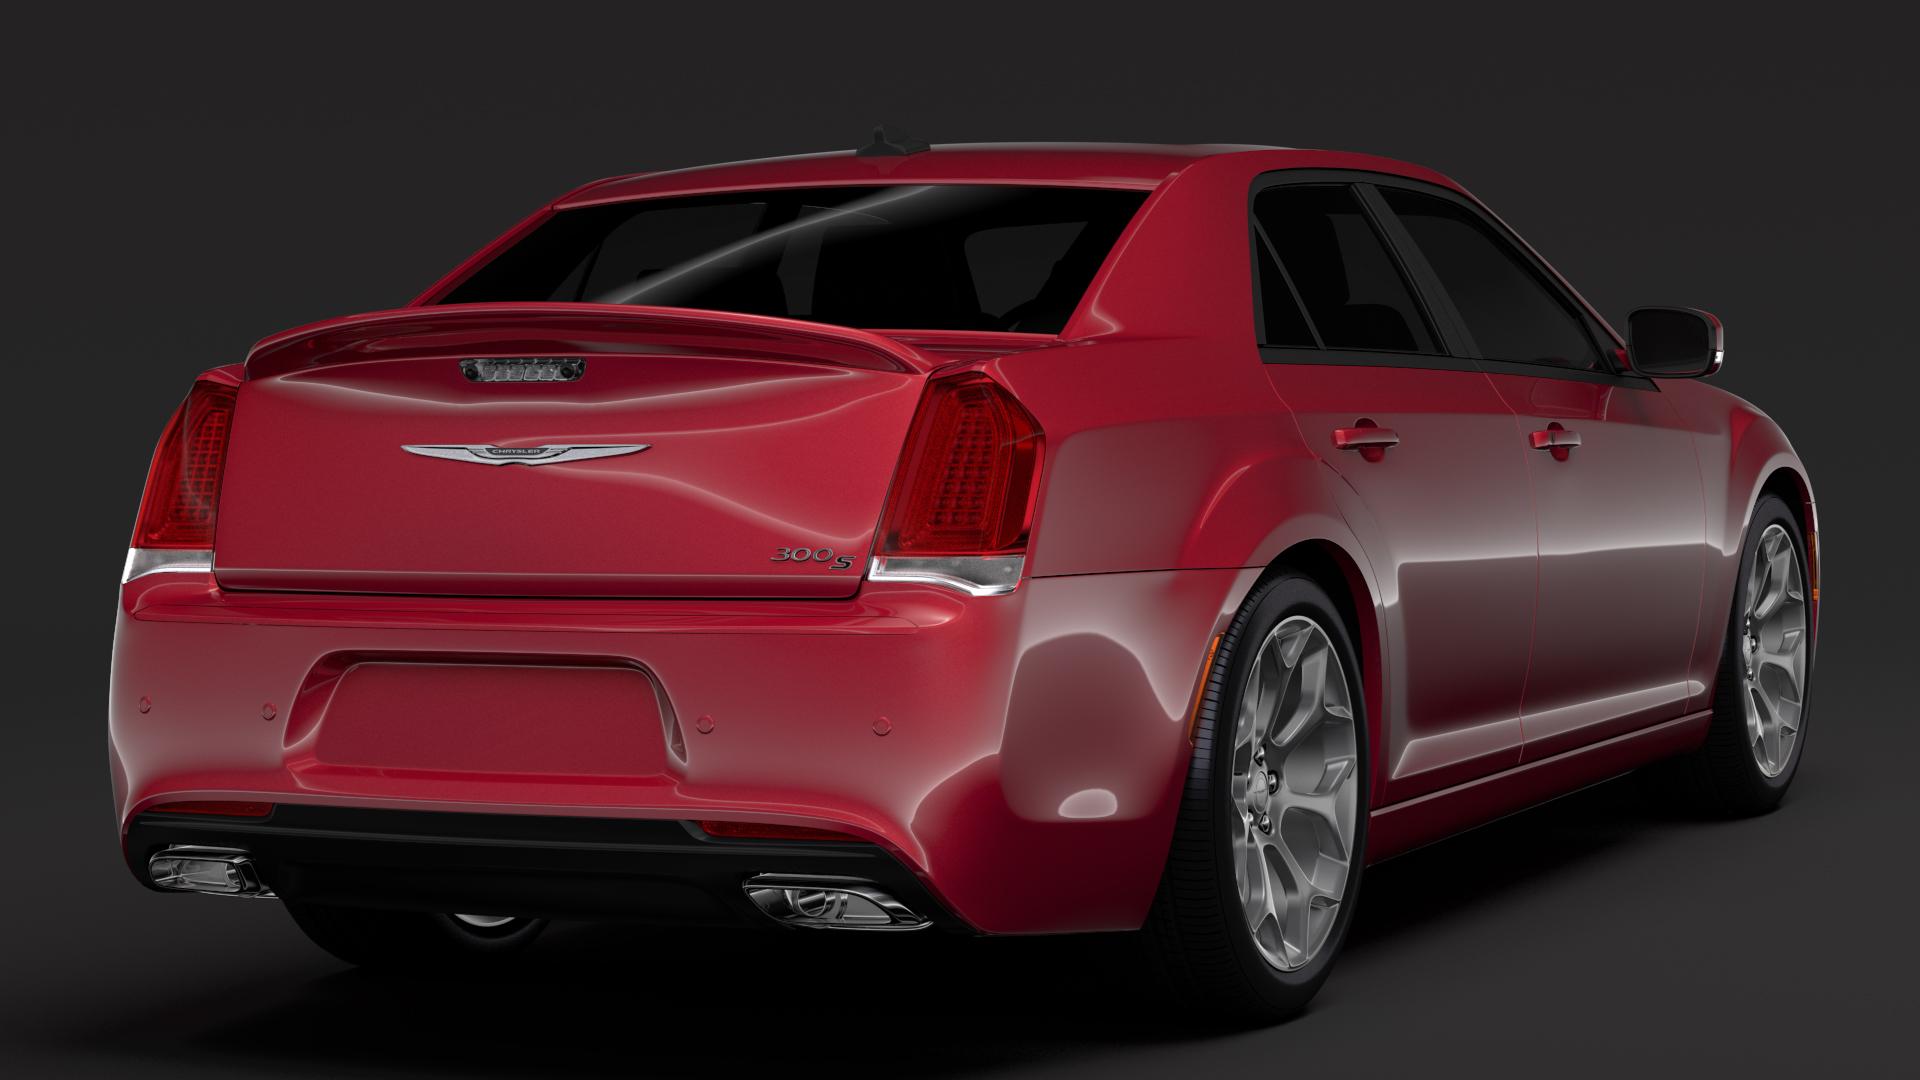 chrysler 300 s sport lx2 2018 3d model 3ds max fbx c4d lwo ma mb hrc xsi obj 284571